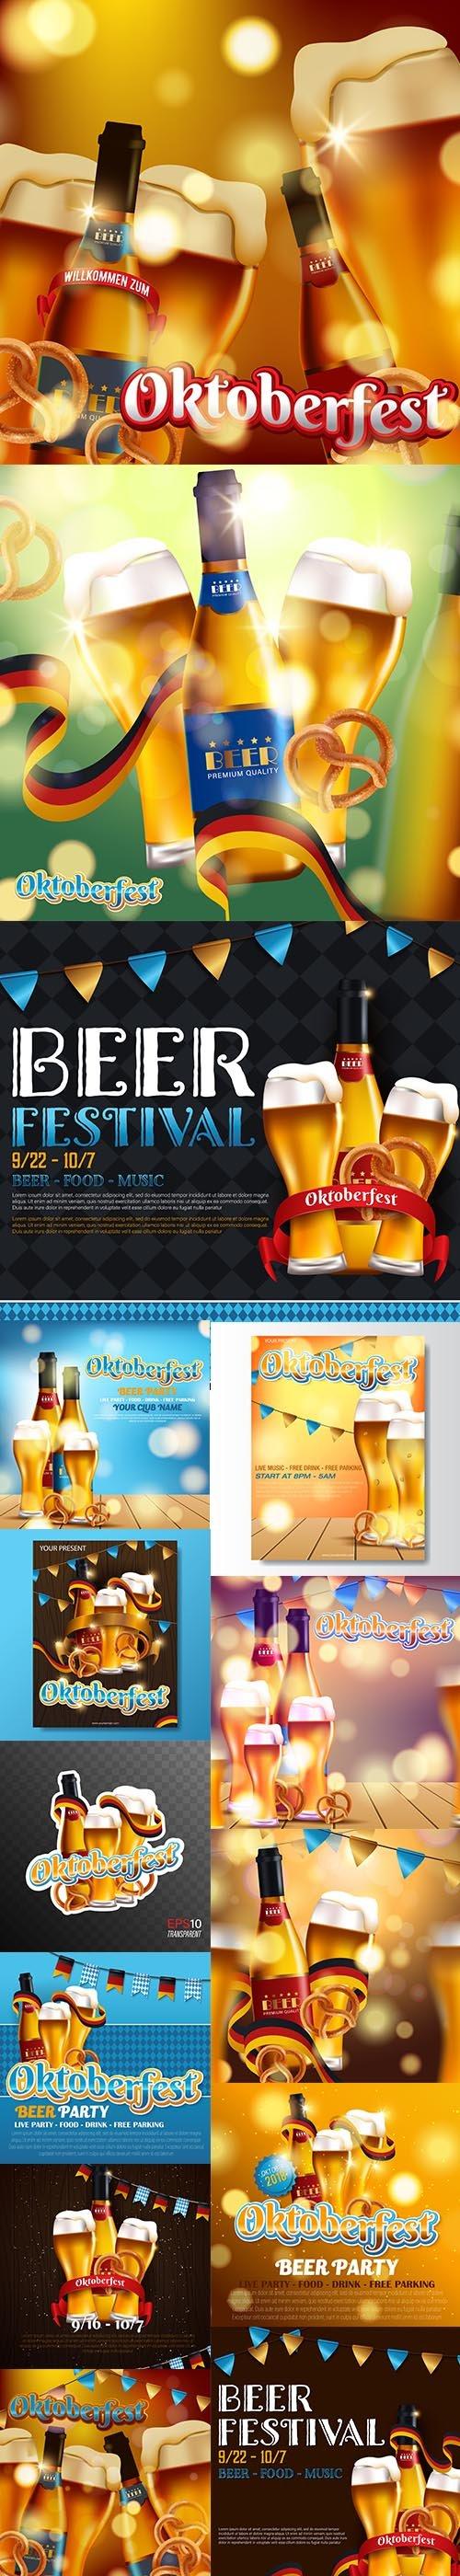 Advertising Traditional Oktoberfest Beer Festival Illustrations Set